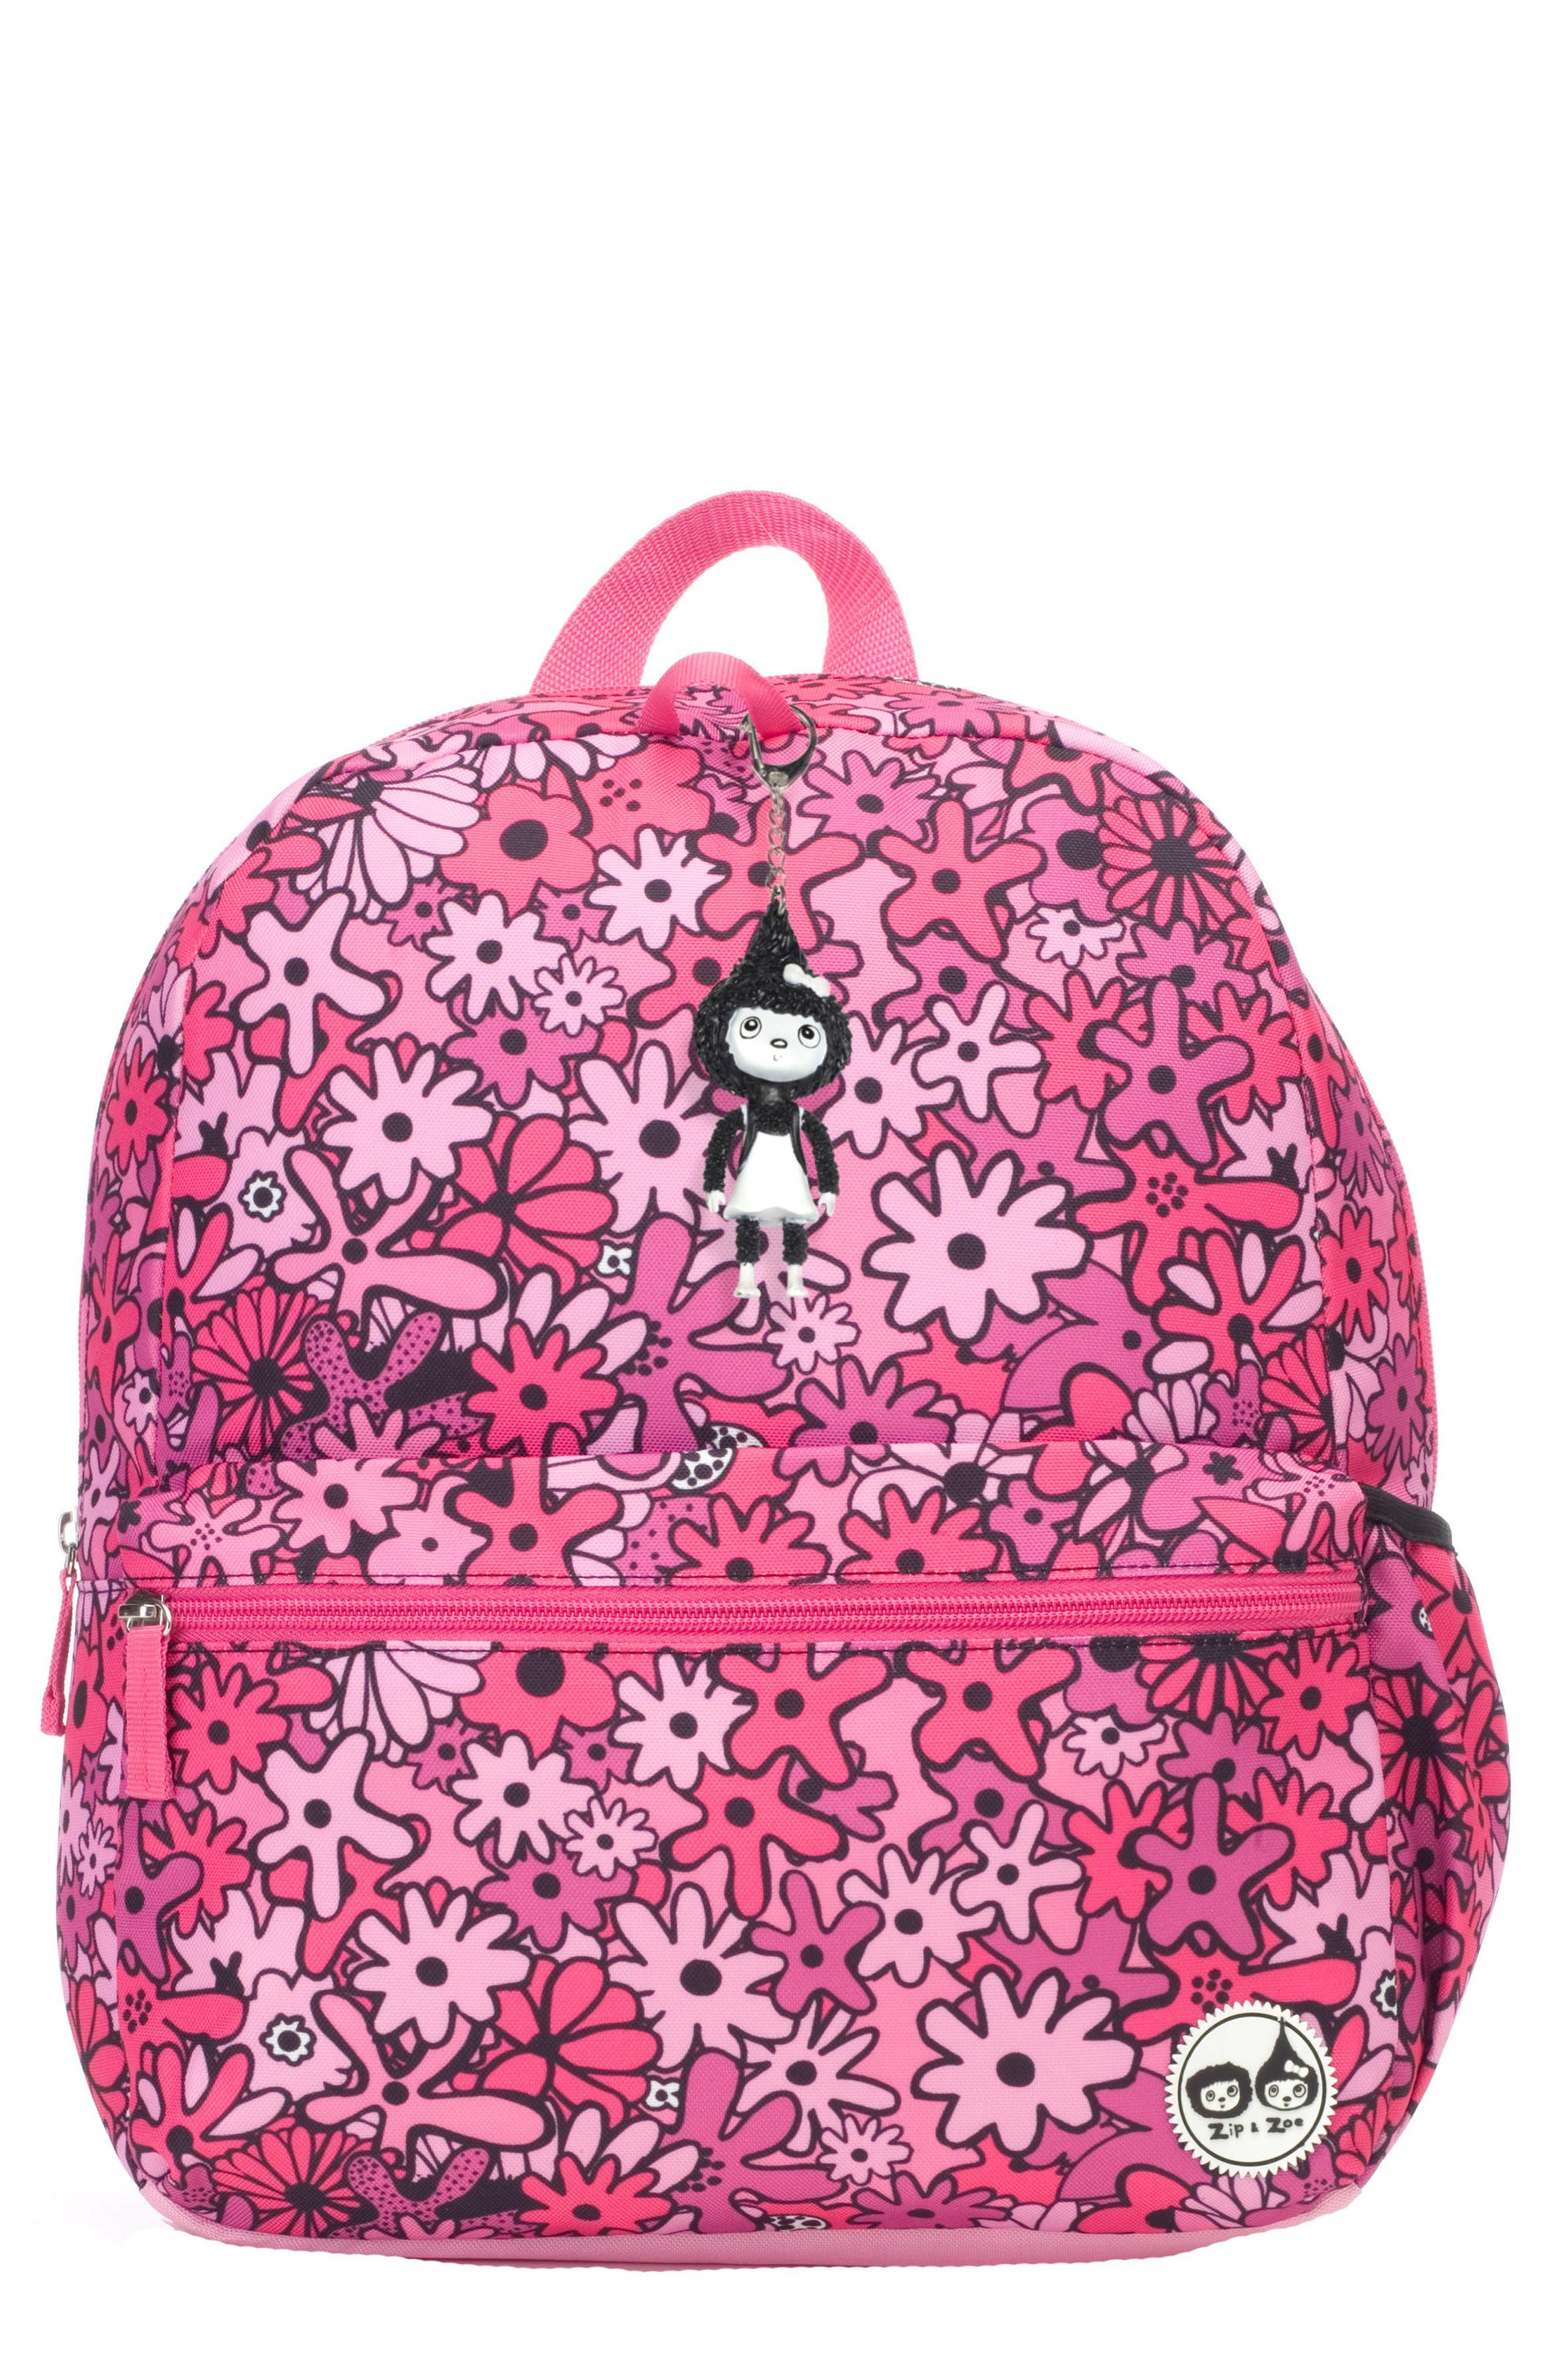 Zip & Zoe Floral Junior Backpack,                         Main,                         color, FLORAL PINK